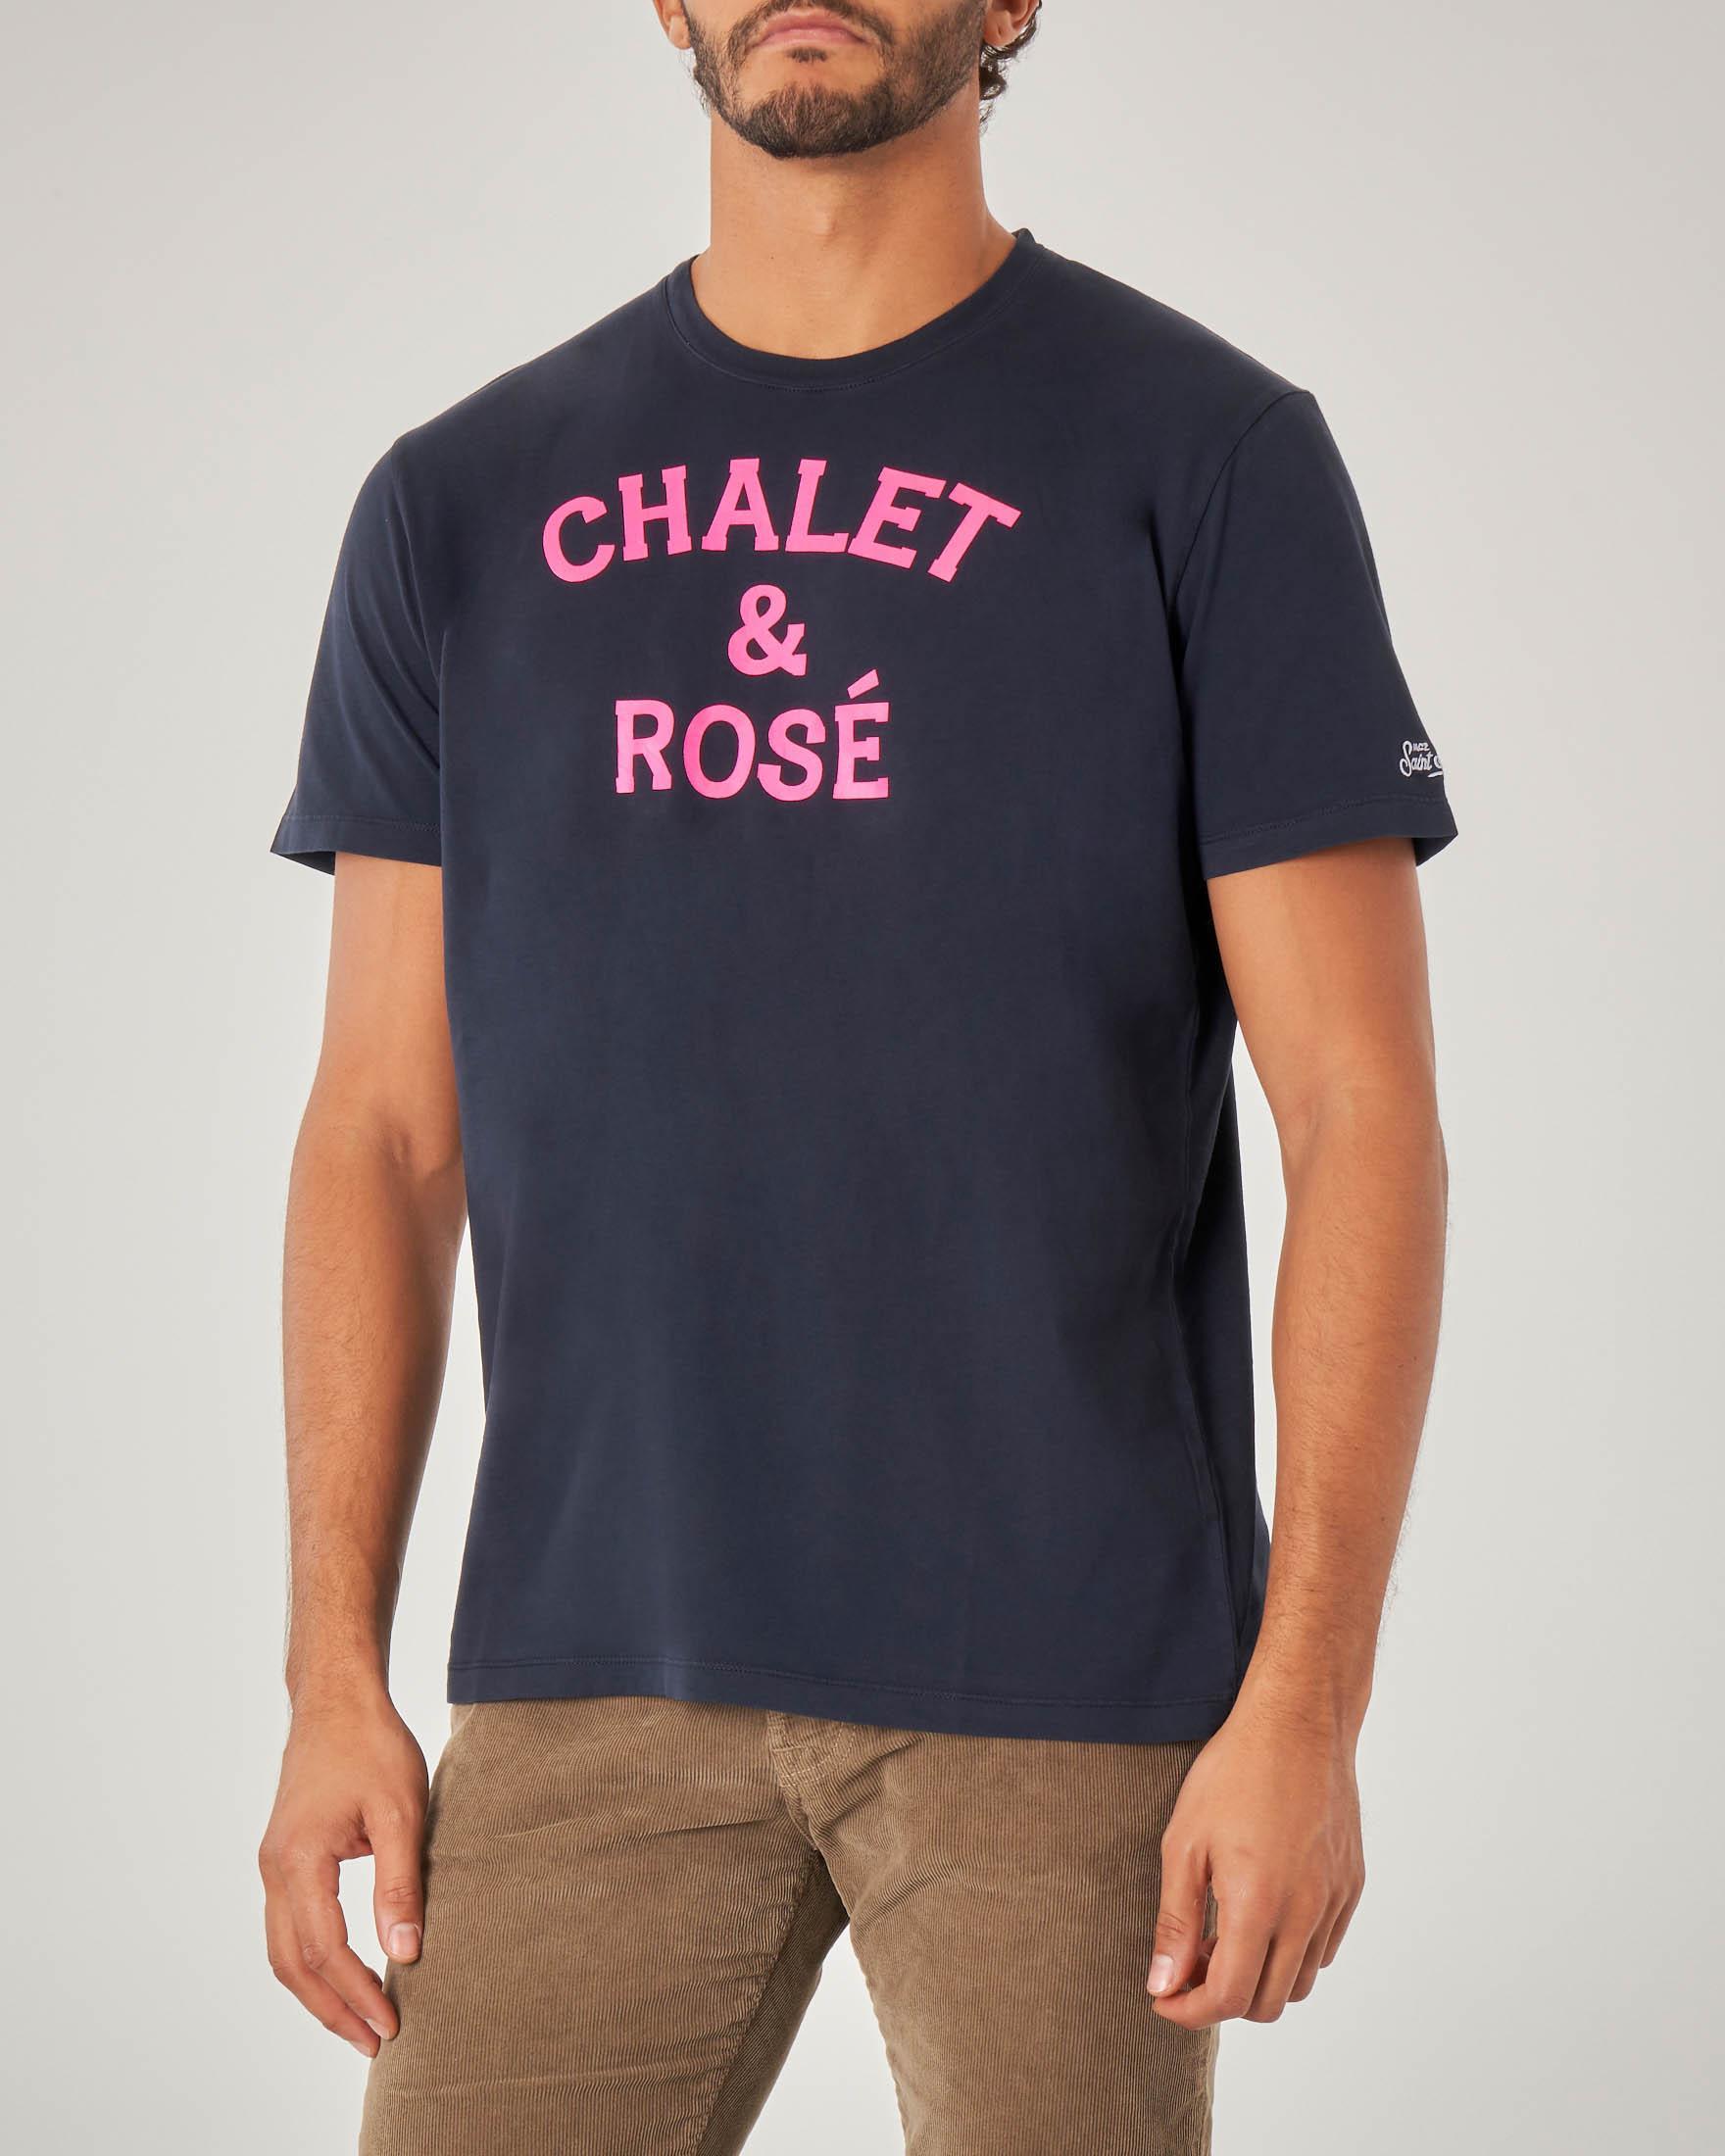 T-shirt blu mezza manica con scritta Chalet & Rosé